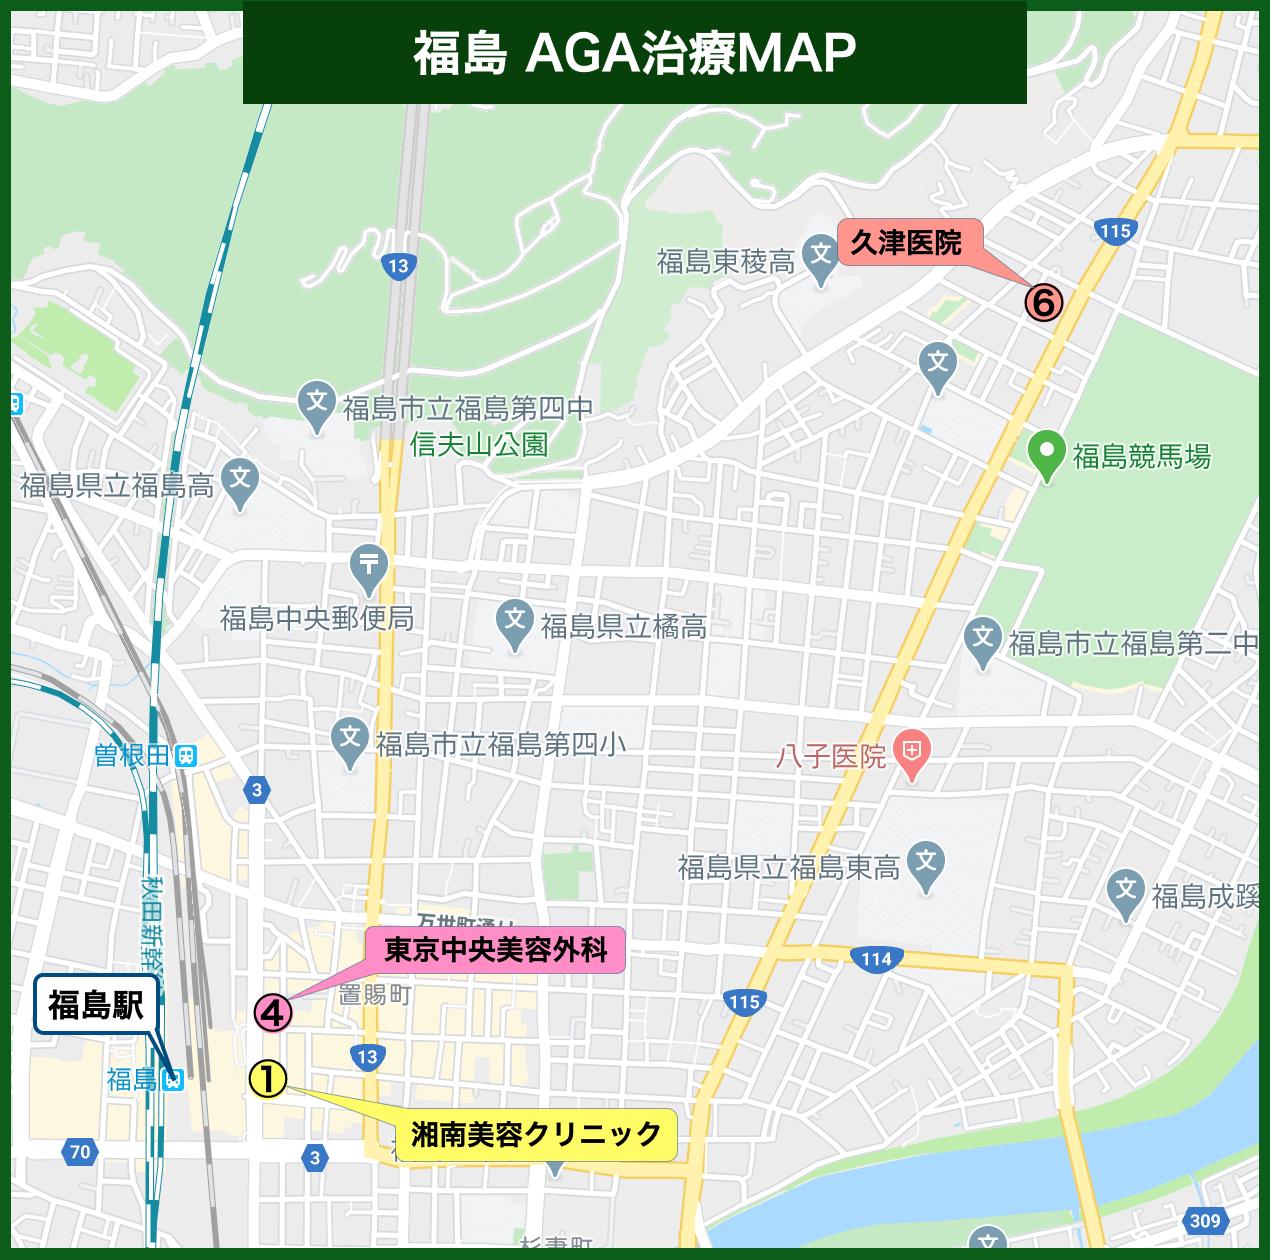 福島 AGA治療MAP